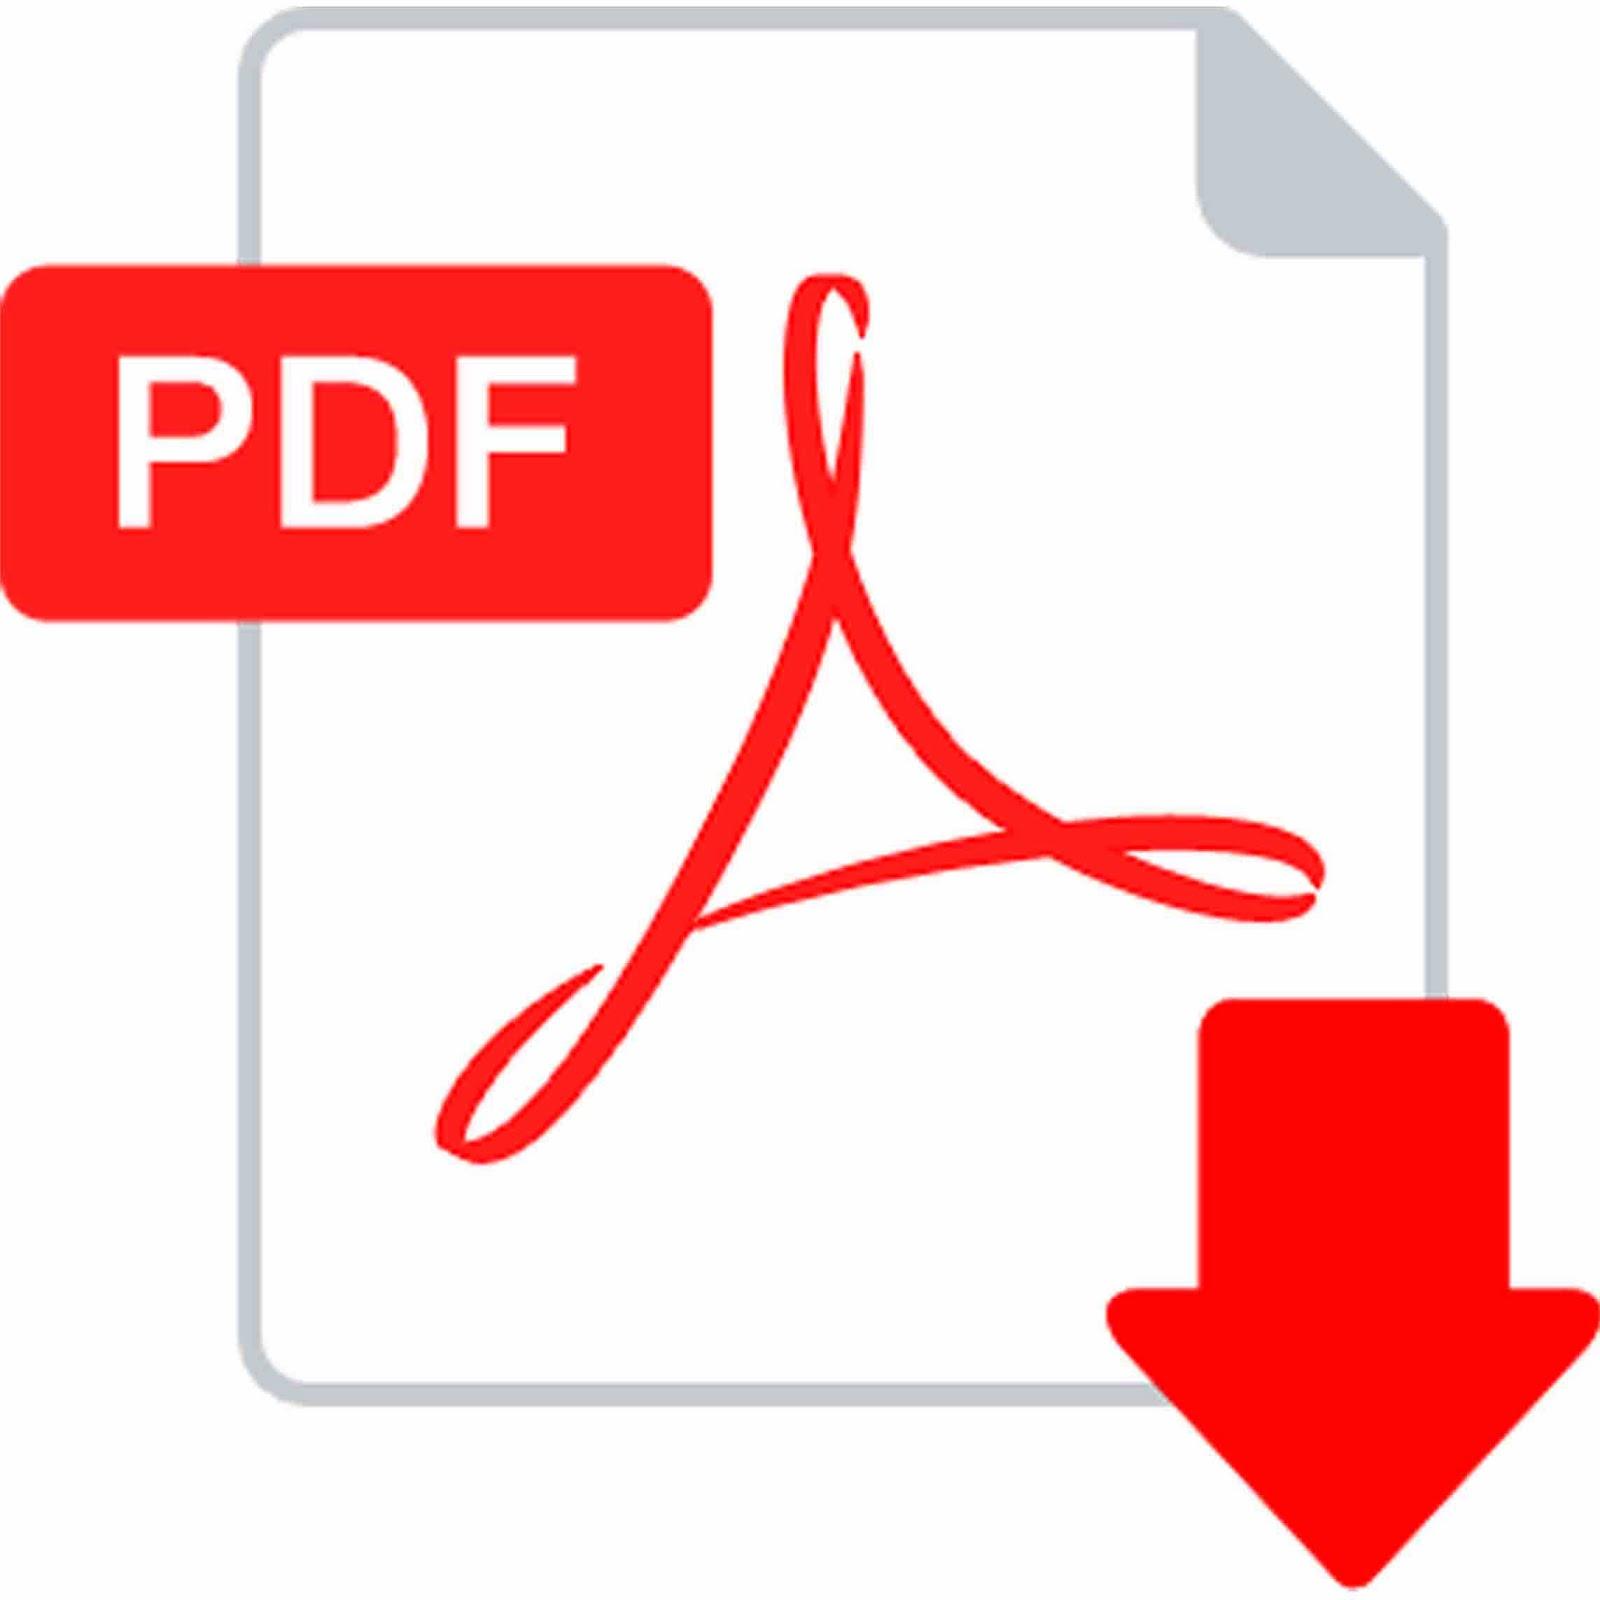 Мотоблок урал. технические параметры и сферы применения. мотоблок «урал»: технические характеристики